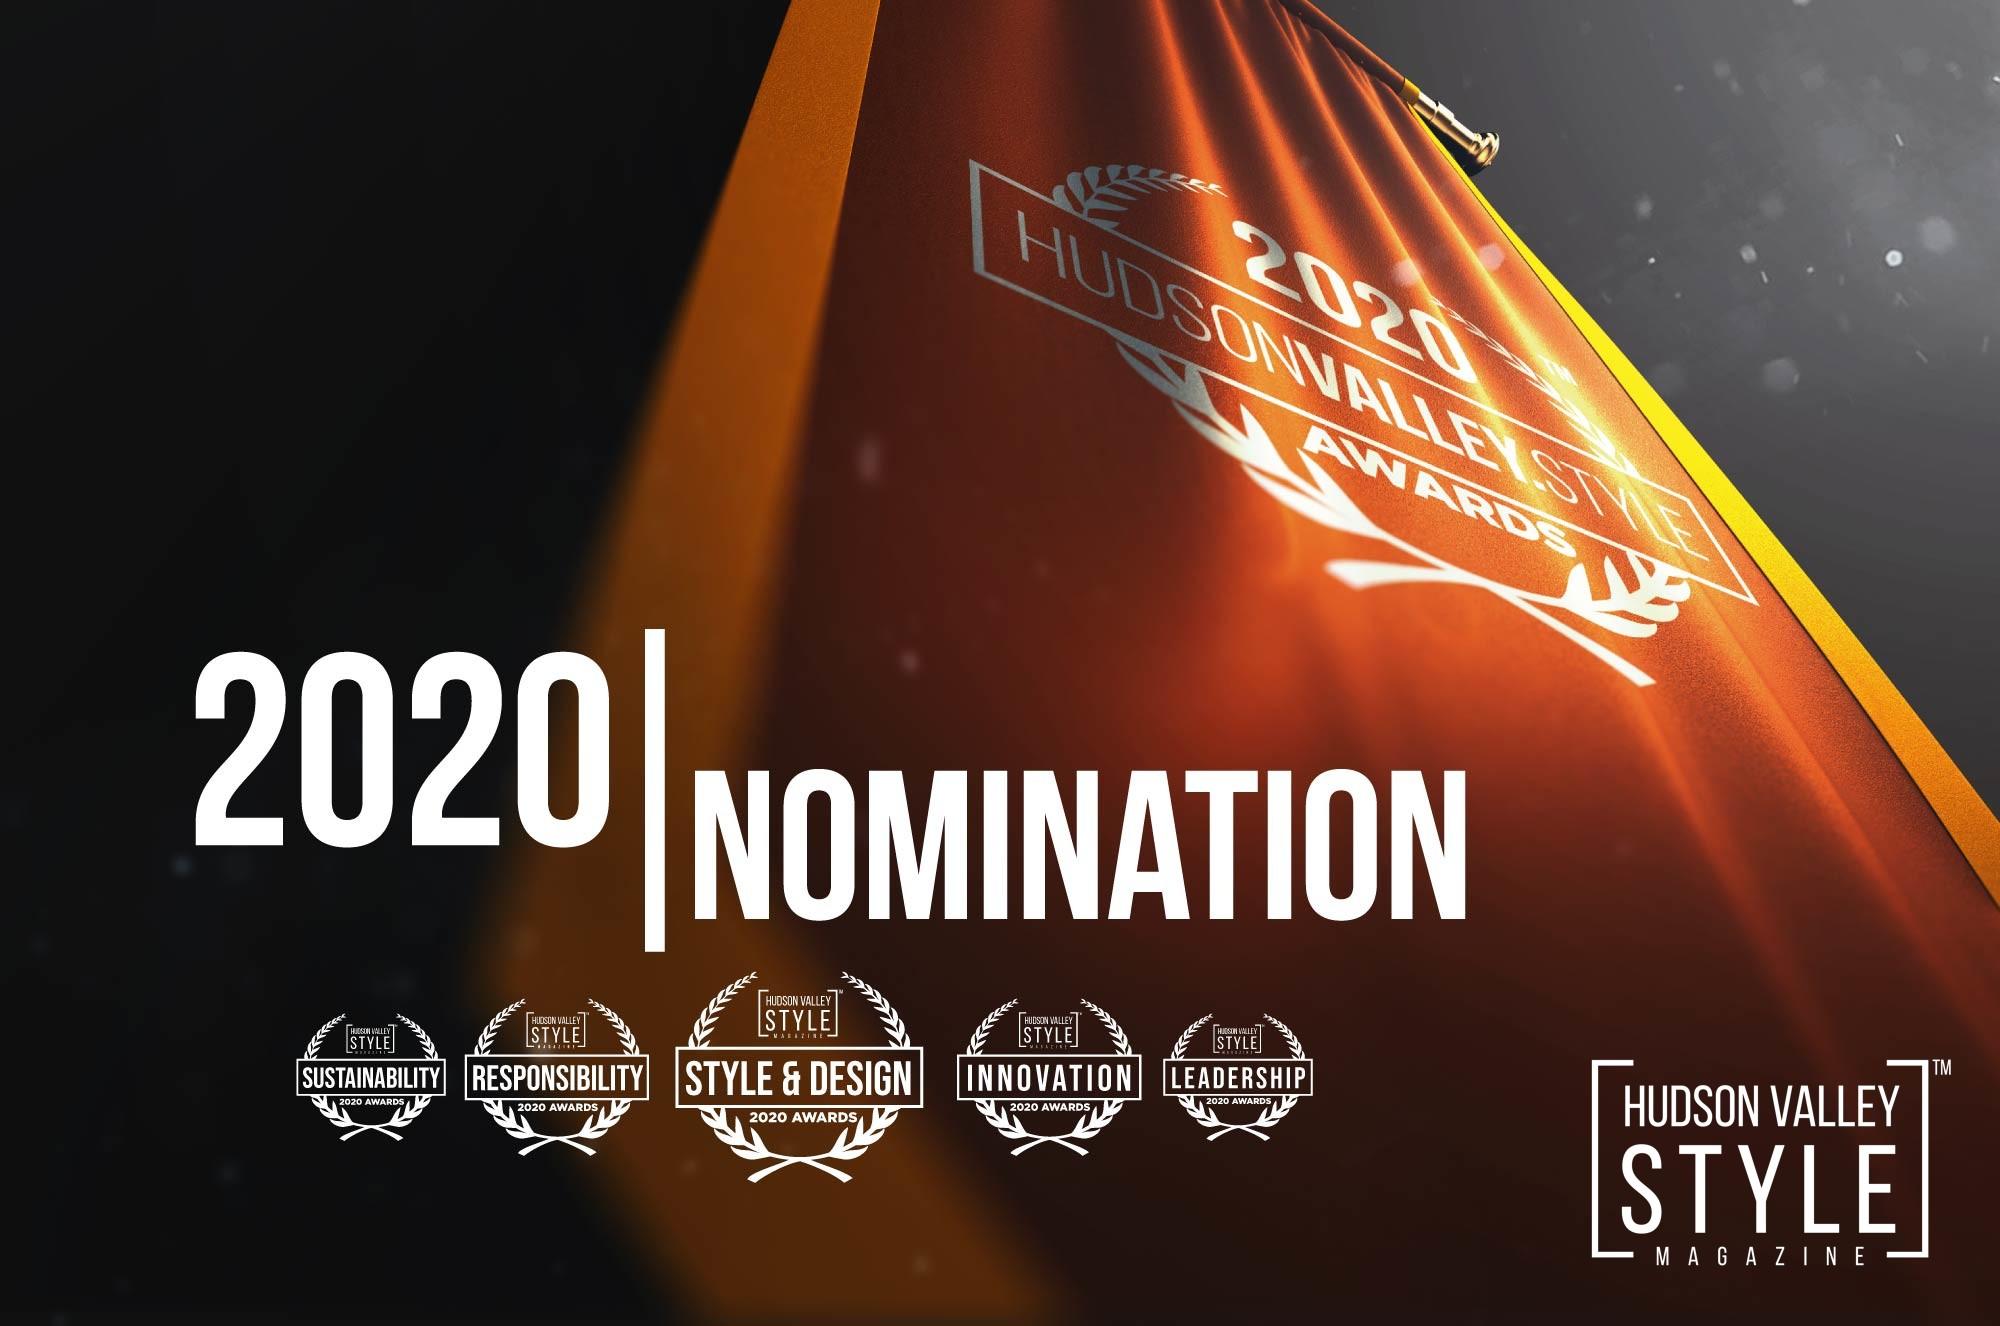 2020 Hudson Valley Style Magazine Nomination